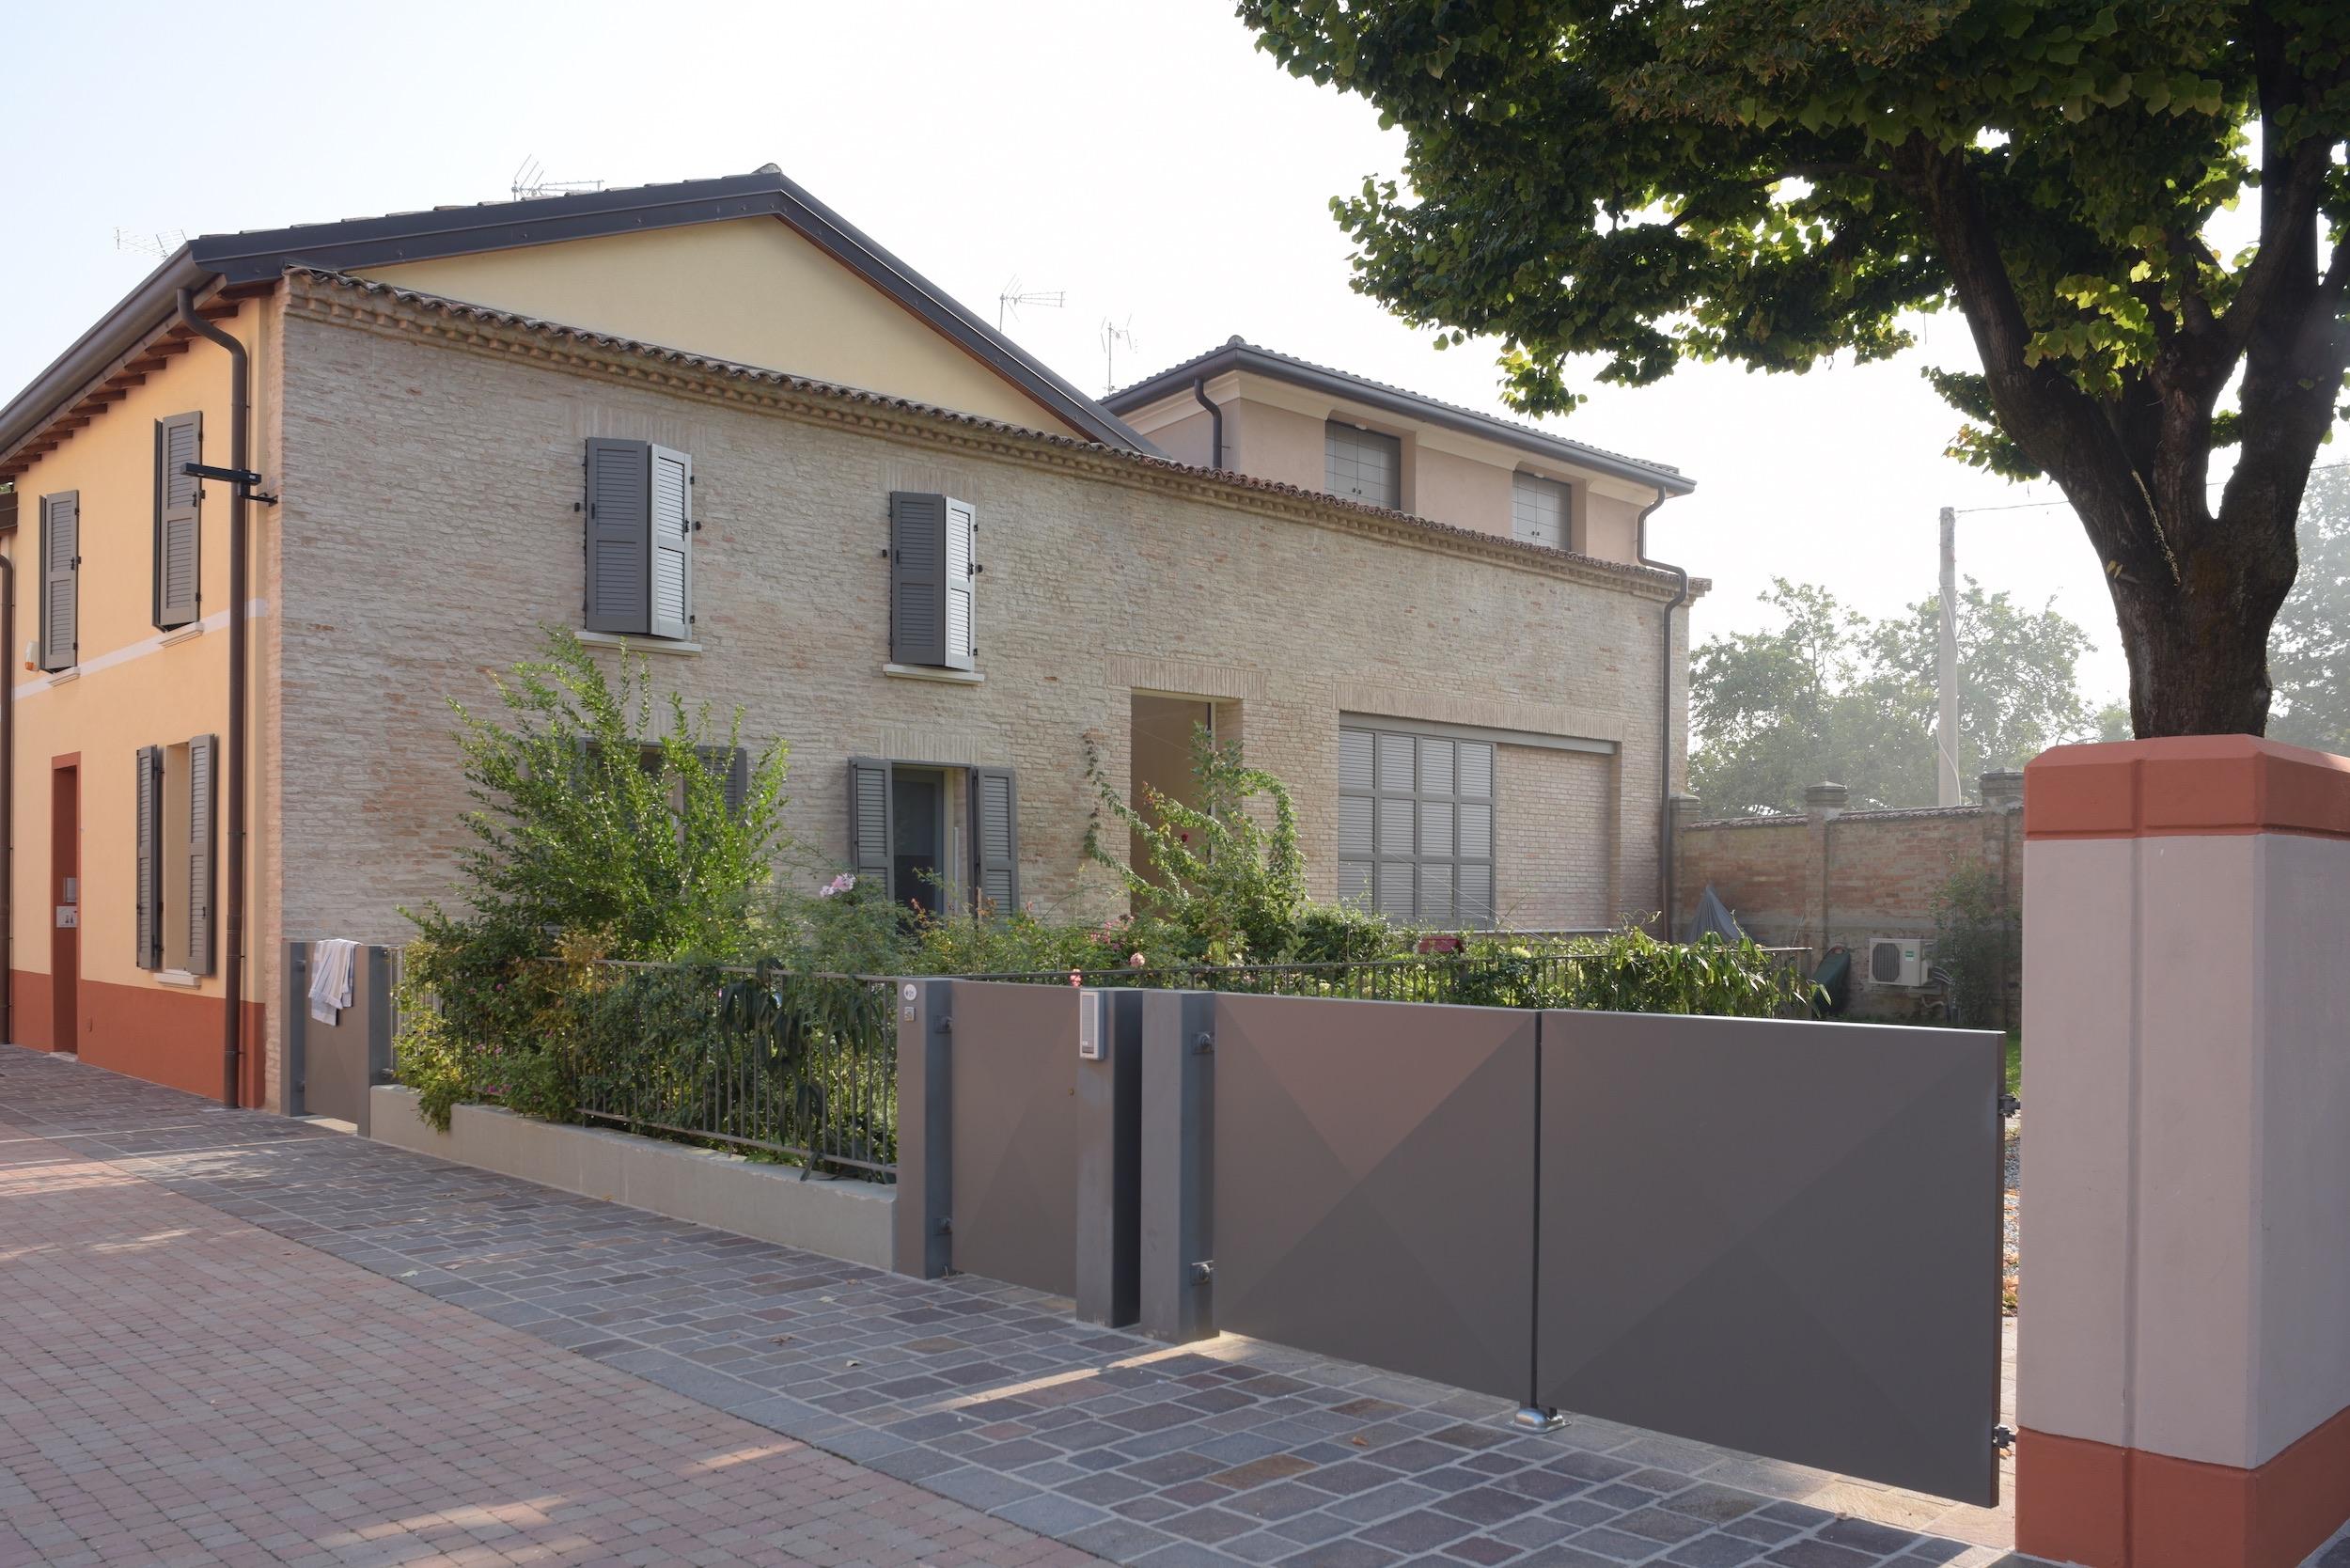 1303 Studio Bacchi Architetti Santa Chiara Residenziale